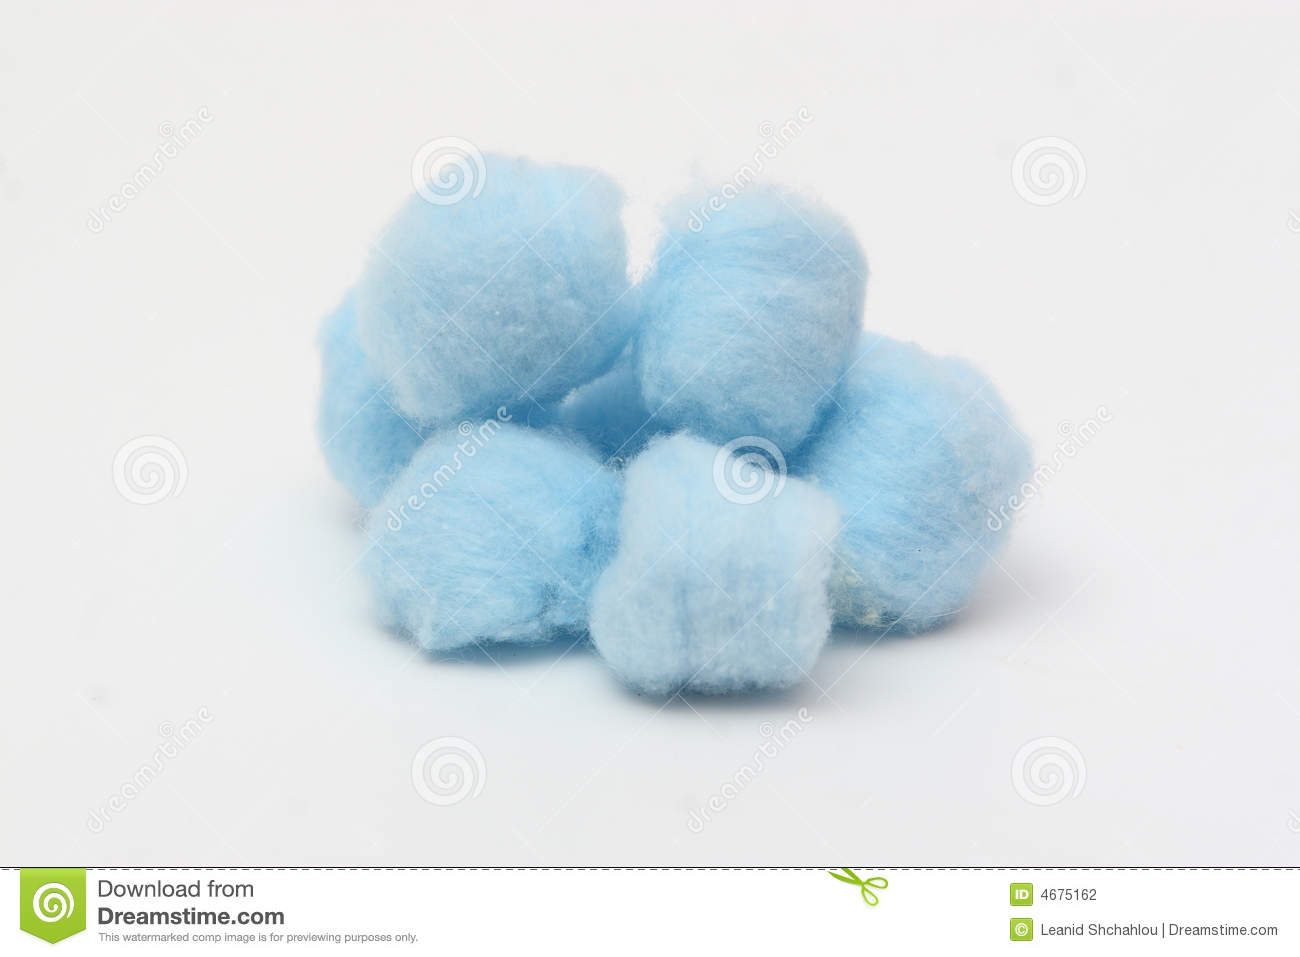 Blue Hygienic Cotton Balls Stock Photography.